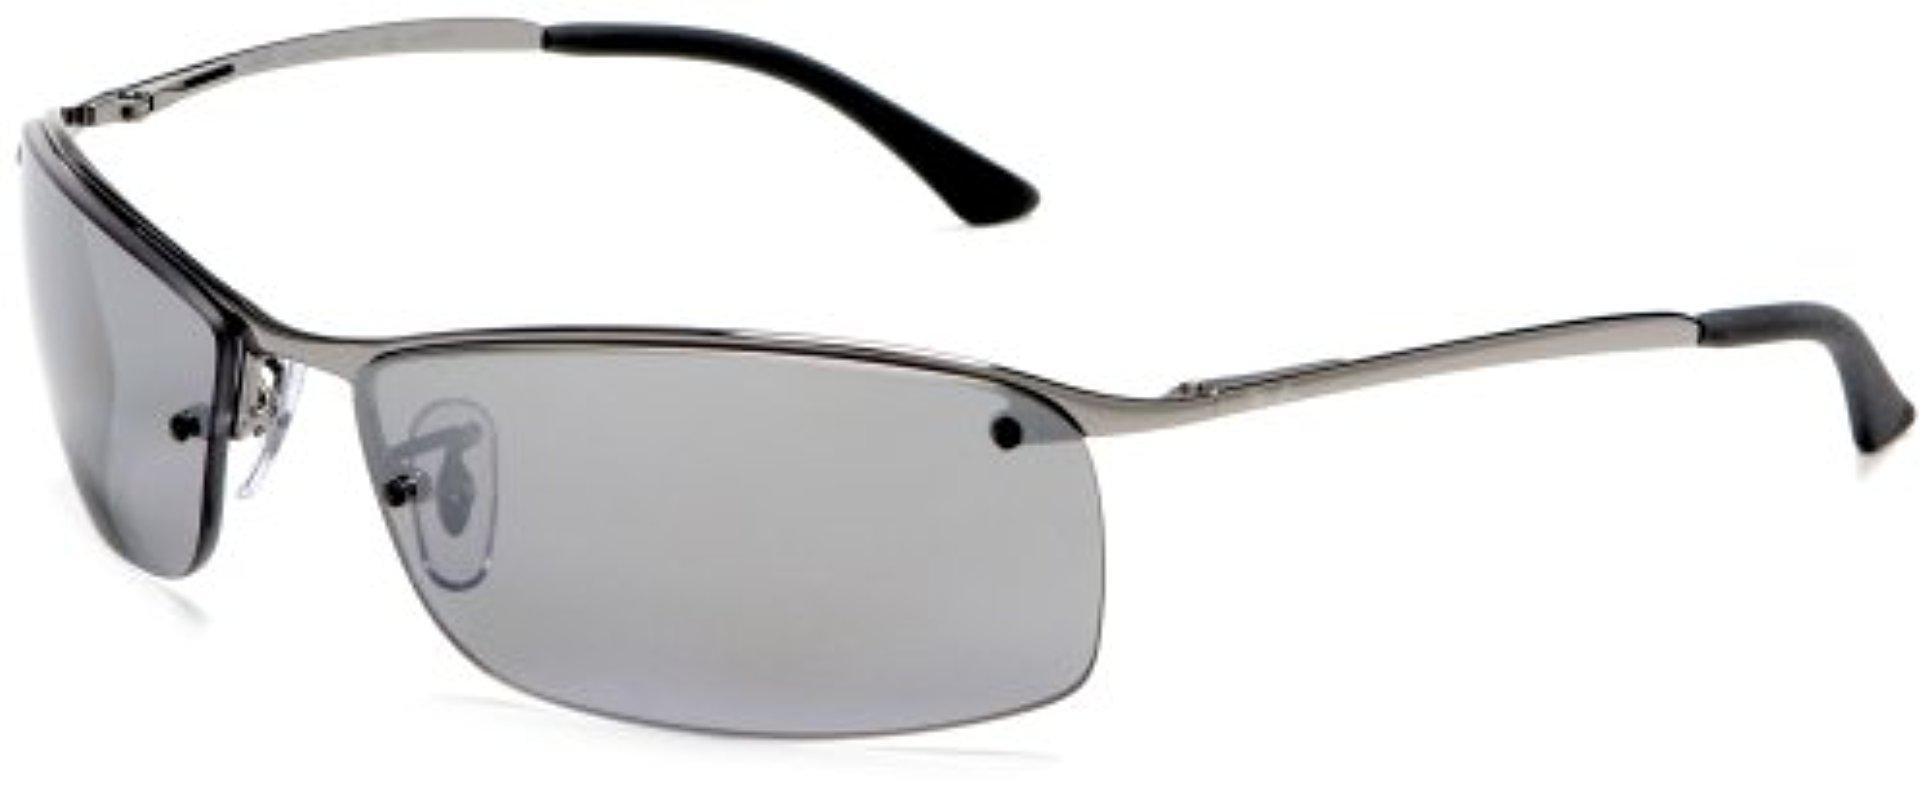 f4043cdd4e5cb3 Ray-Ban Rb3183 - Gunmetal Frame Polar Grey Mirror Silver Grad ...